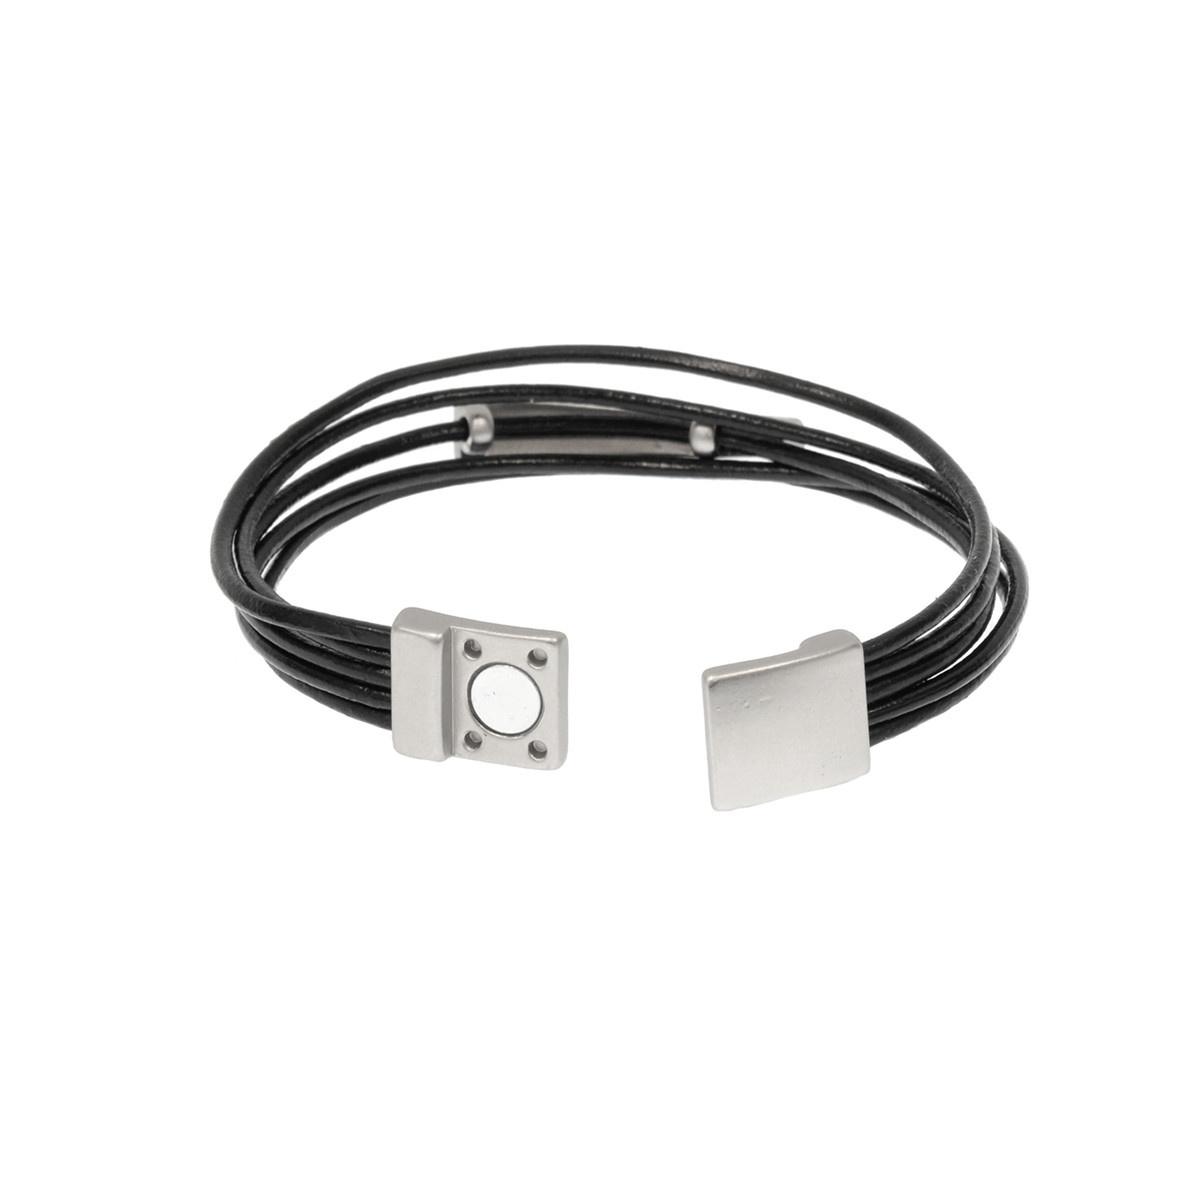 Joy Susan Joy Susan Leather Rhodium Sleek Bar Bracelet Black